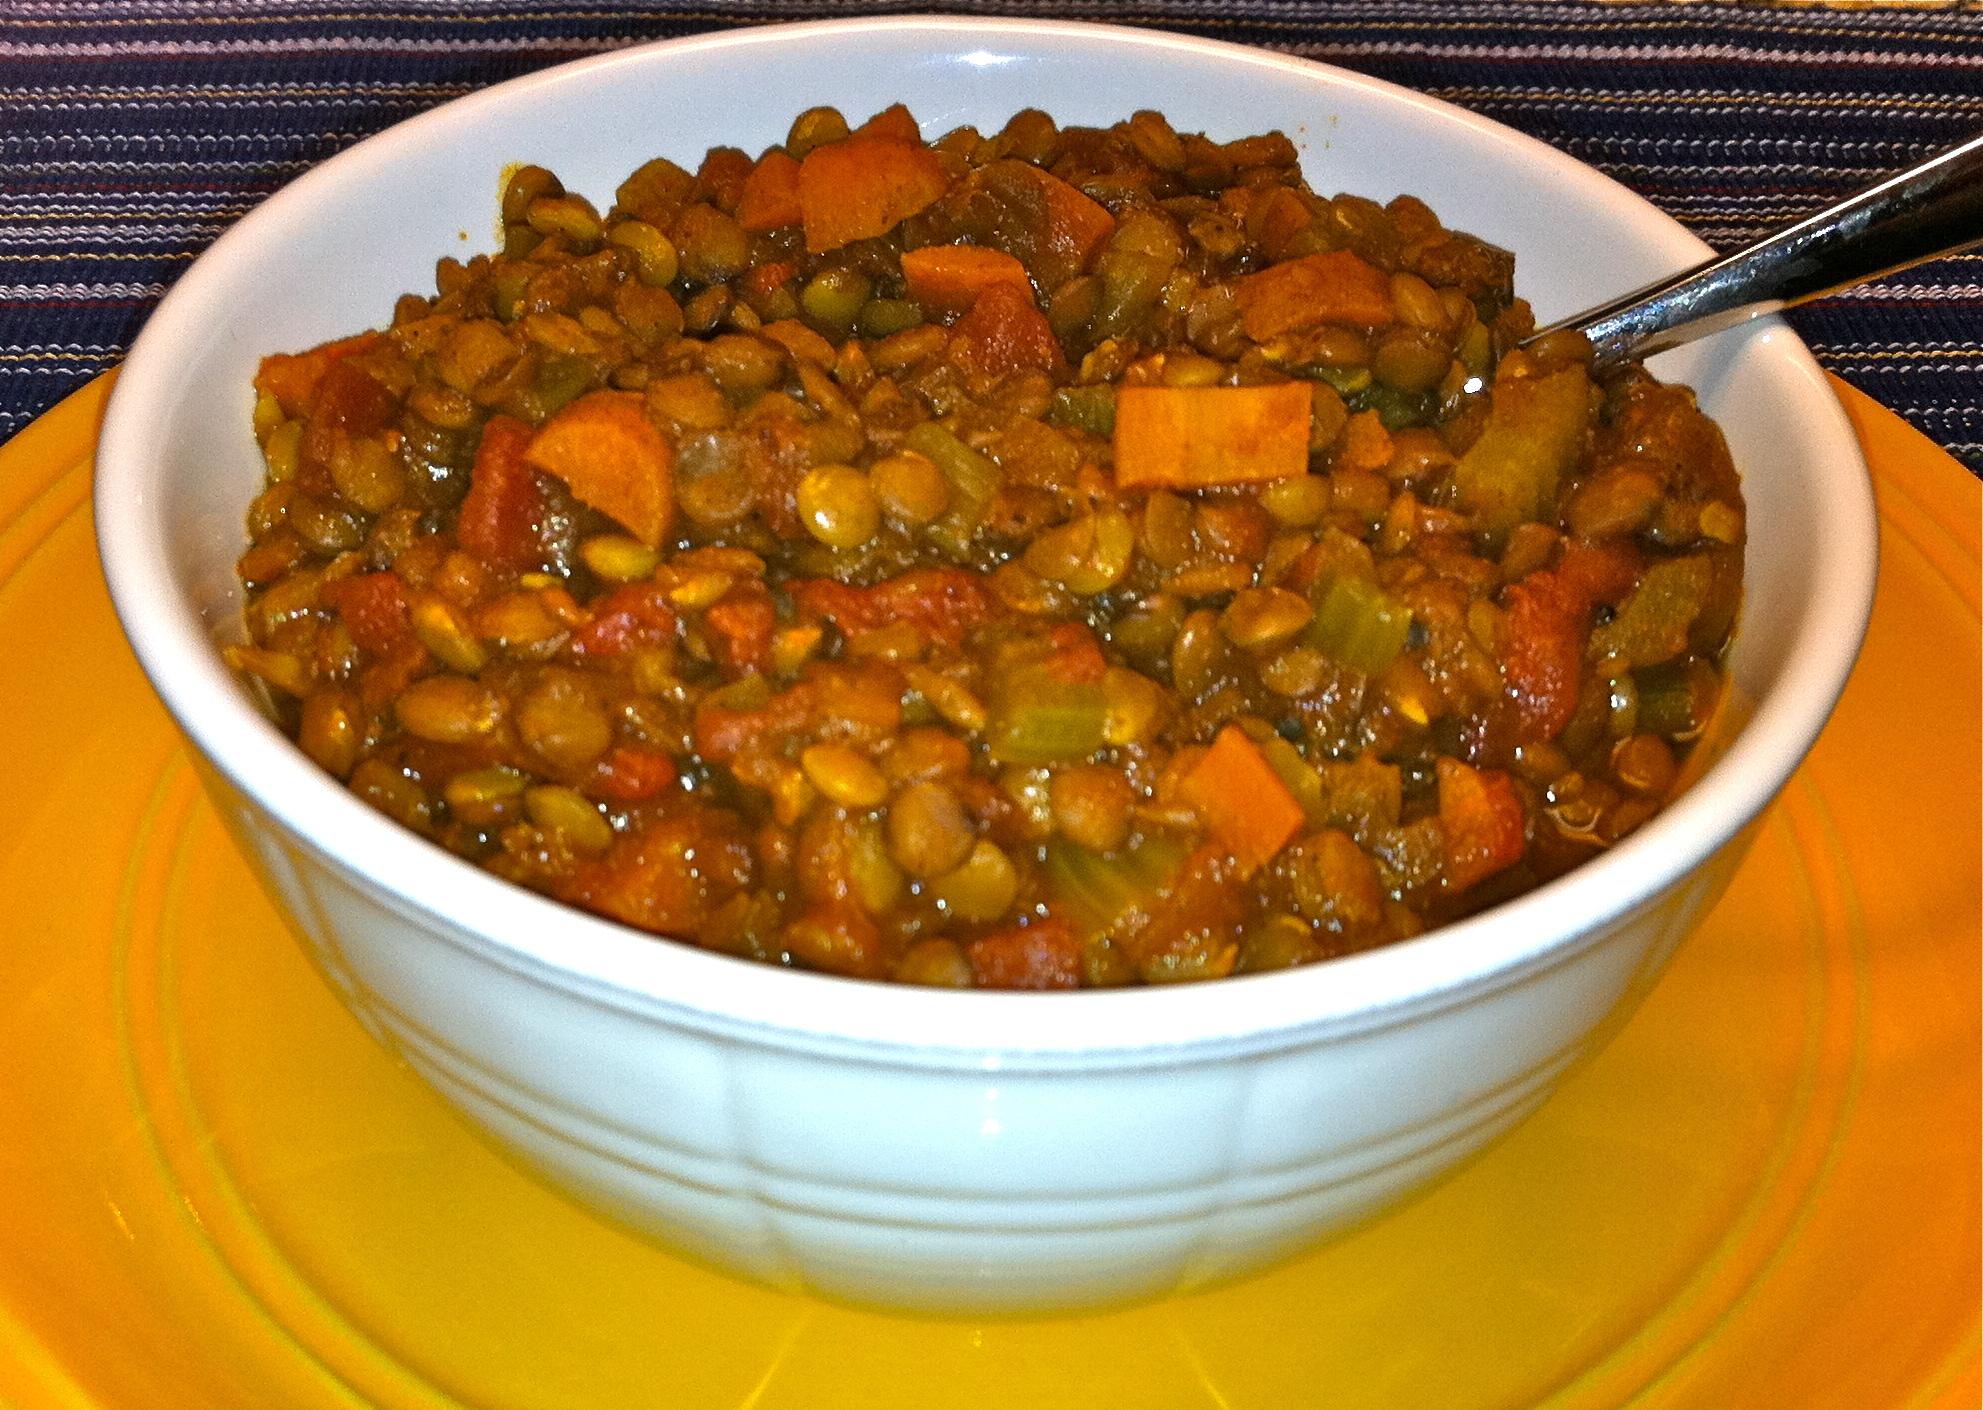 redlightsocial.ml: The Keto Crock Pot Cookbook: Quick And Easy Ketogenic Crock Pot Recipes For Smart People (): Loretta Wagner: Books.